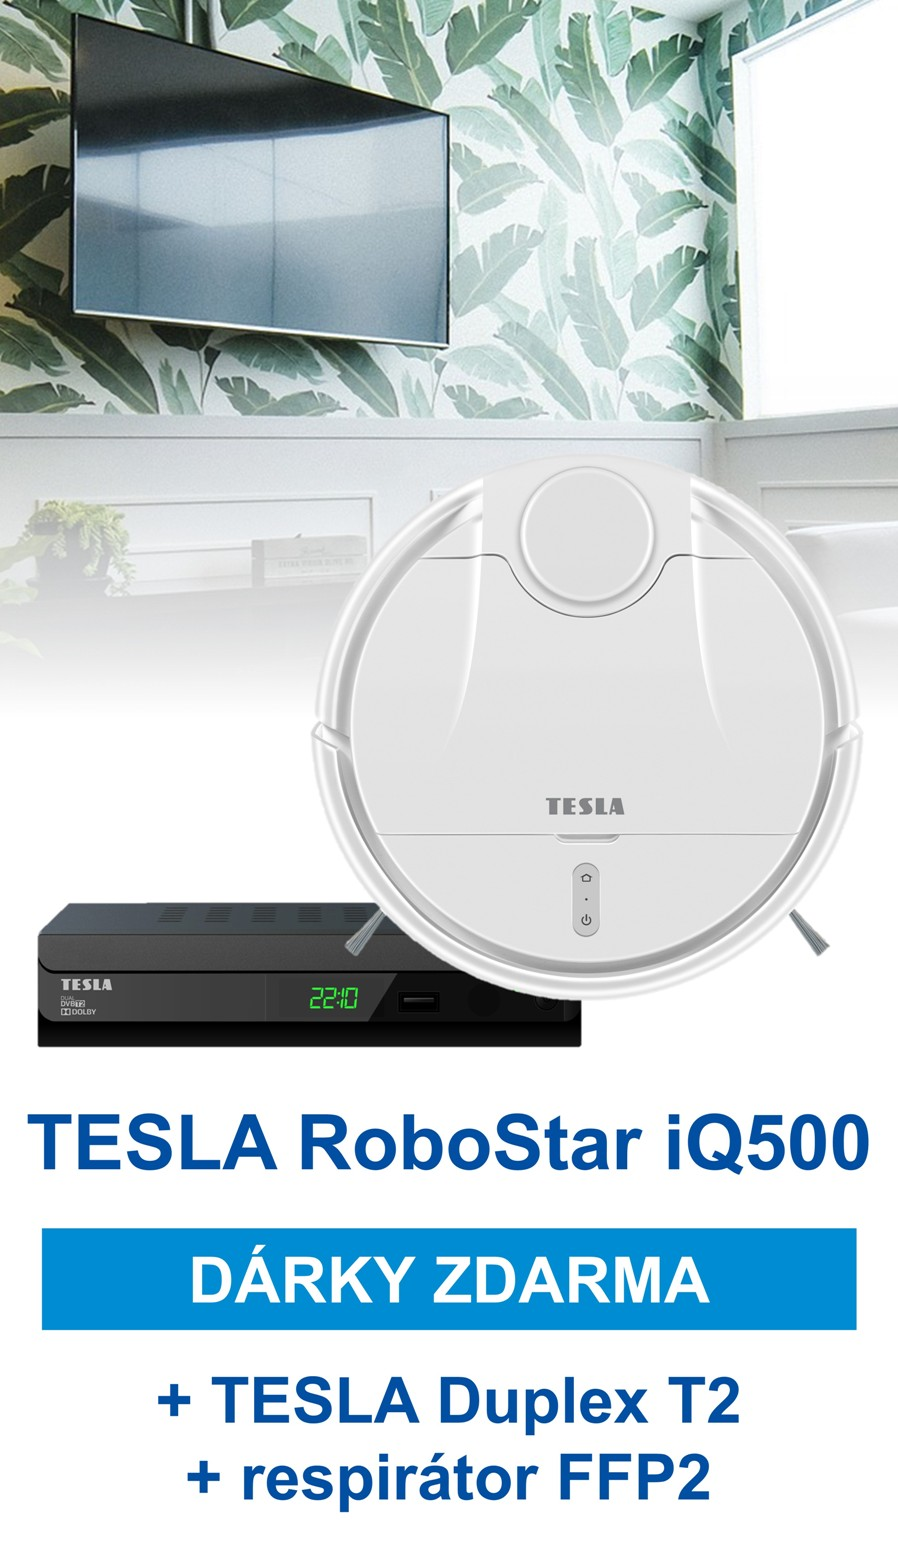 TESLA RoboStar iQ500 + zdarma TESLA Duplex T2 a respirátor FFP2